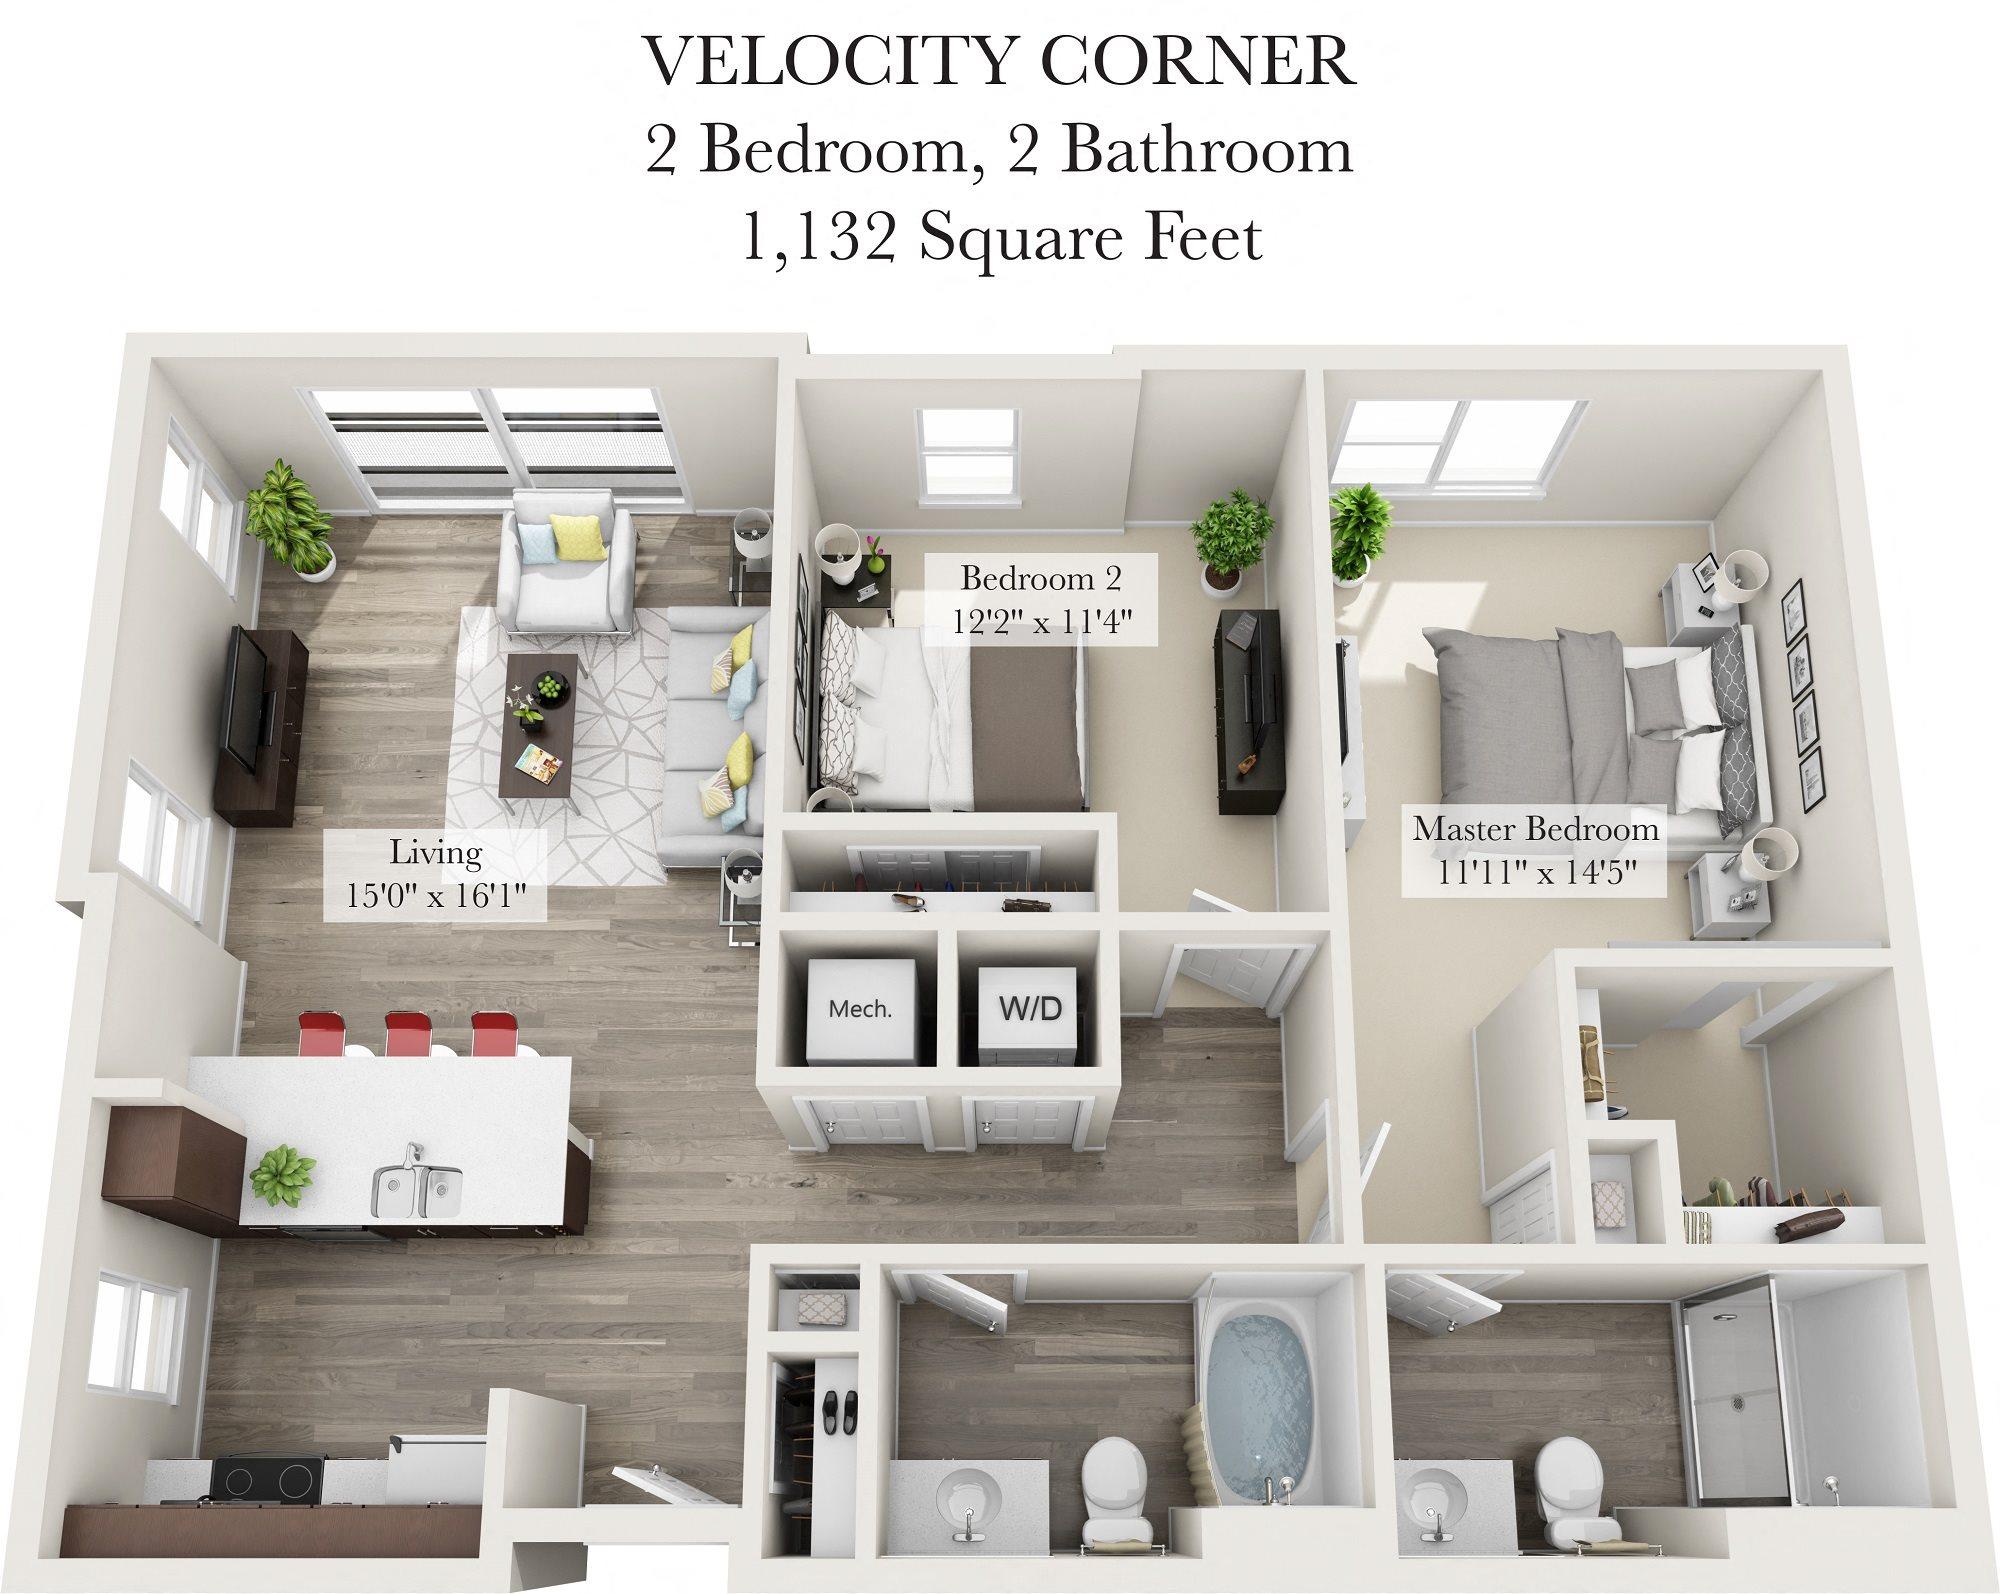 Velocity Corner Floor Plan 10